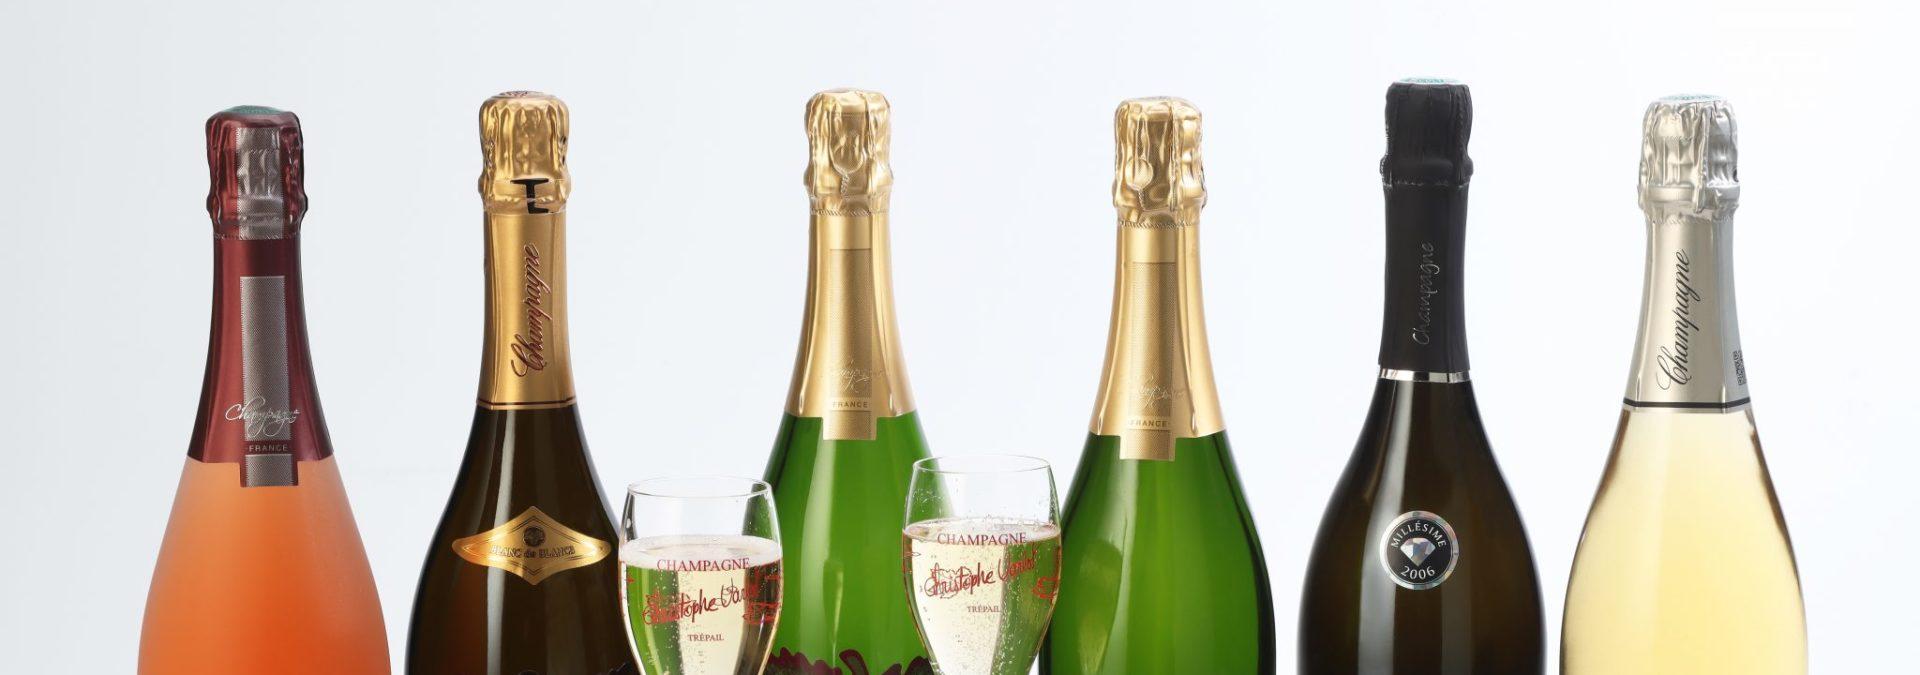 Champagne Christophe Varlot